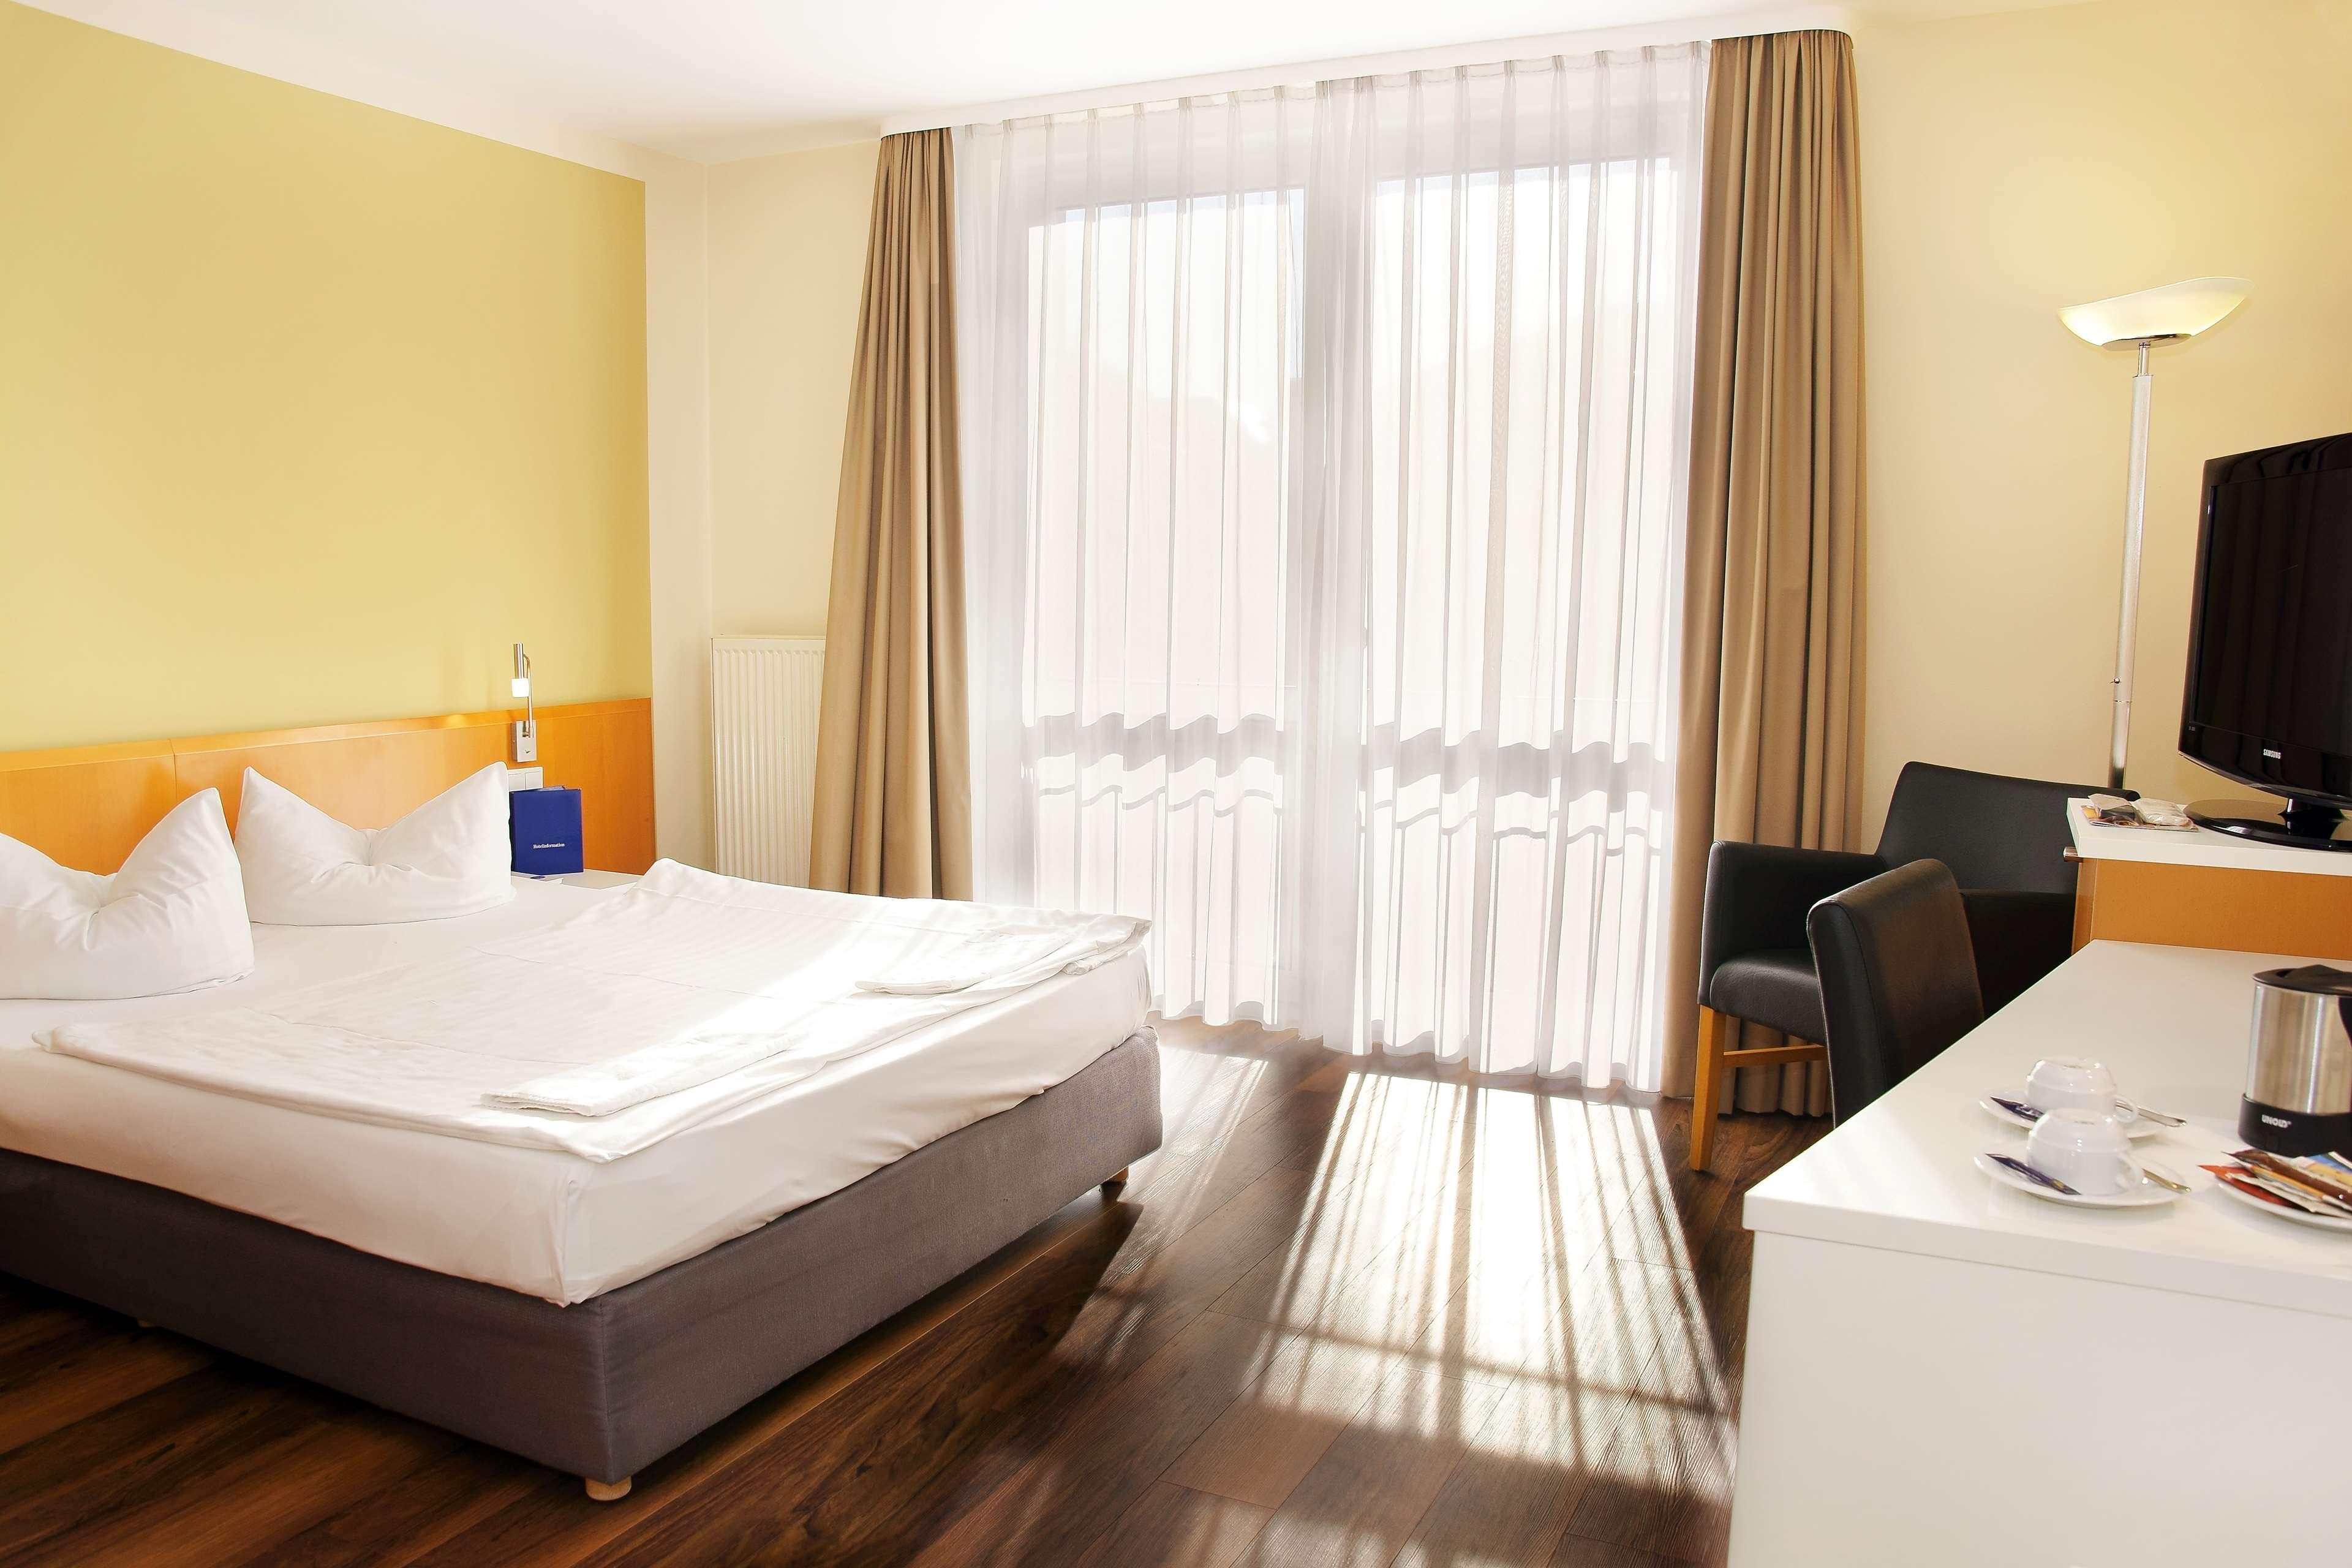 best western macrander hotel dresden hotels hotels restaurants dresden deutschland tel. Black Bedroom Furniture Sets. Home Design Ideas